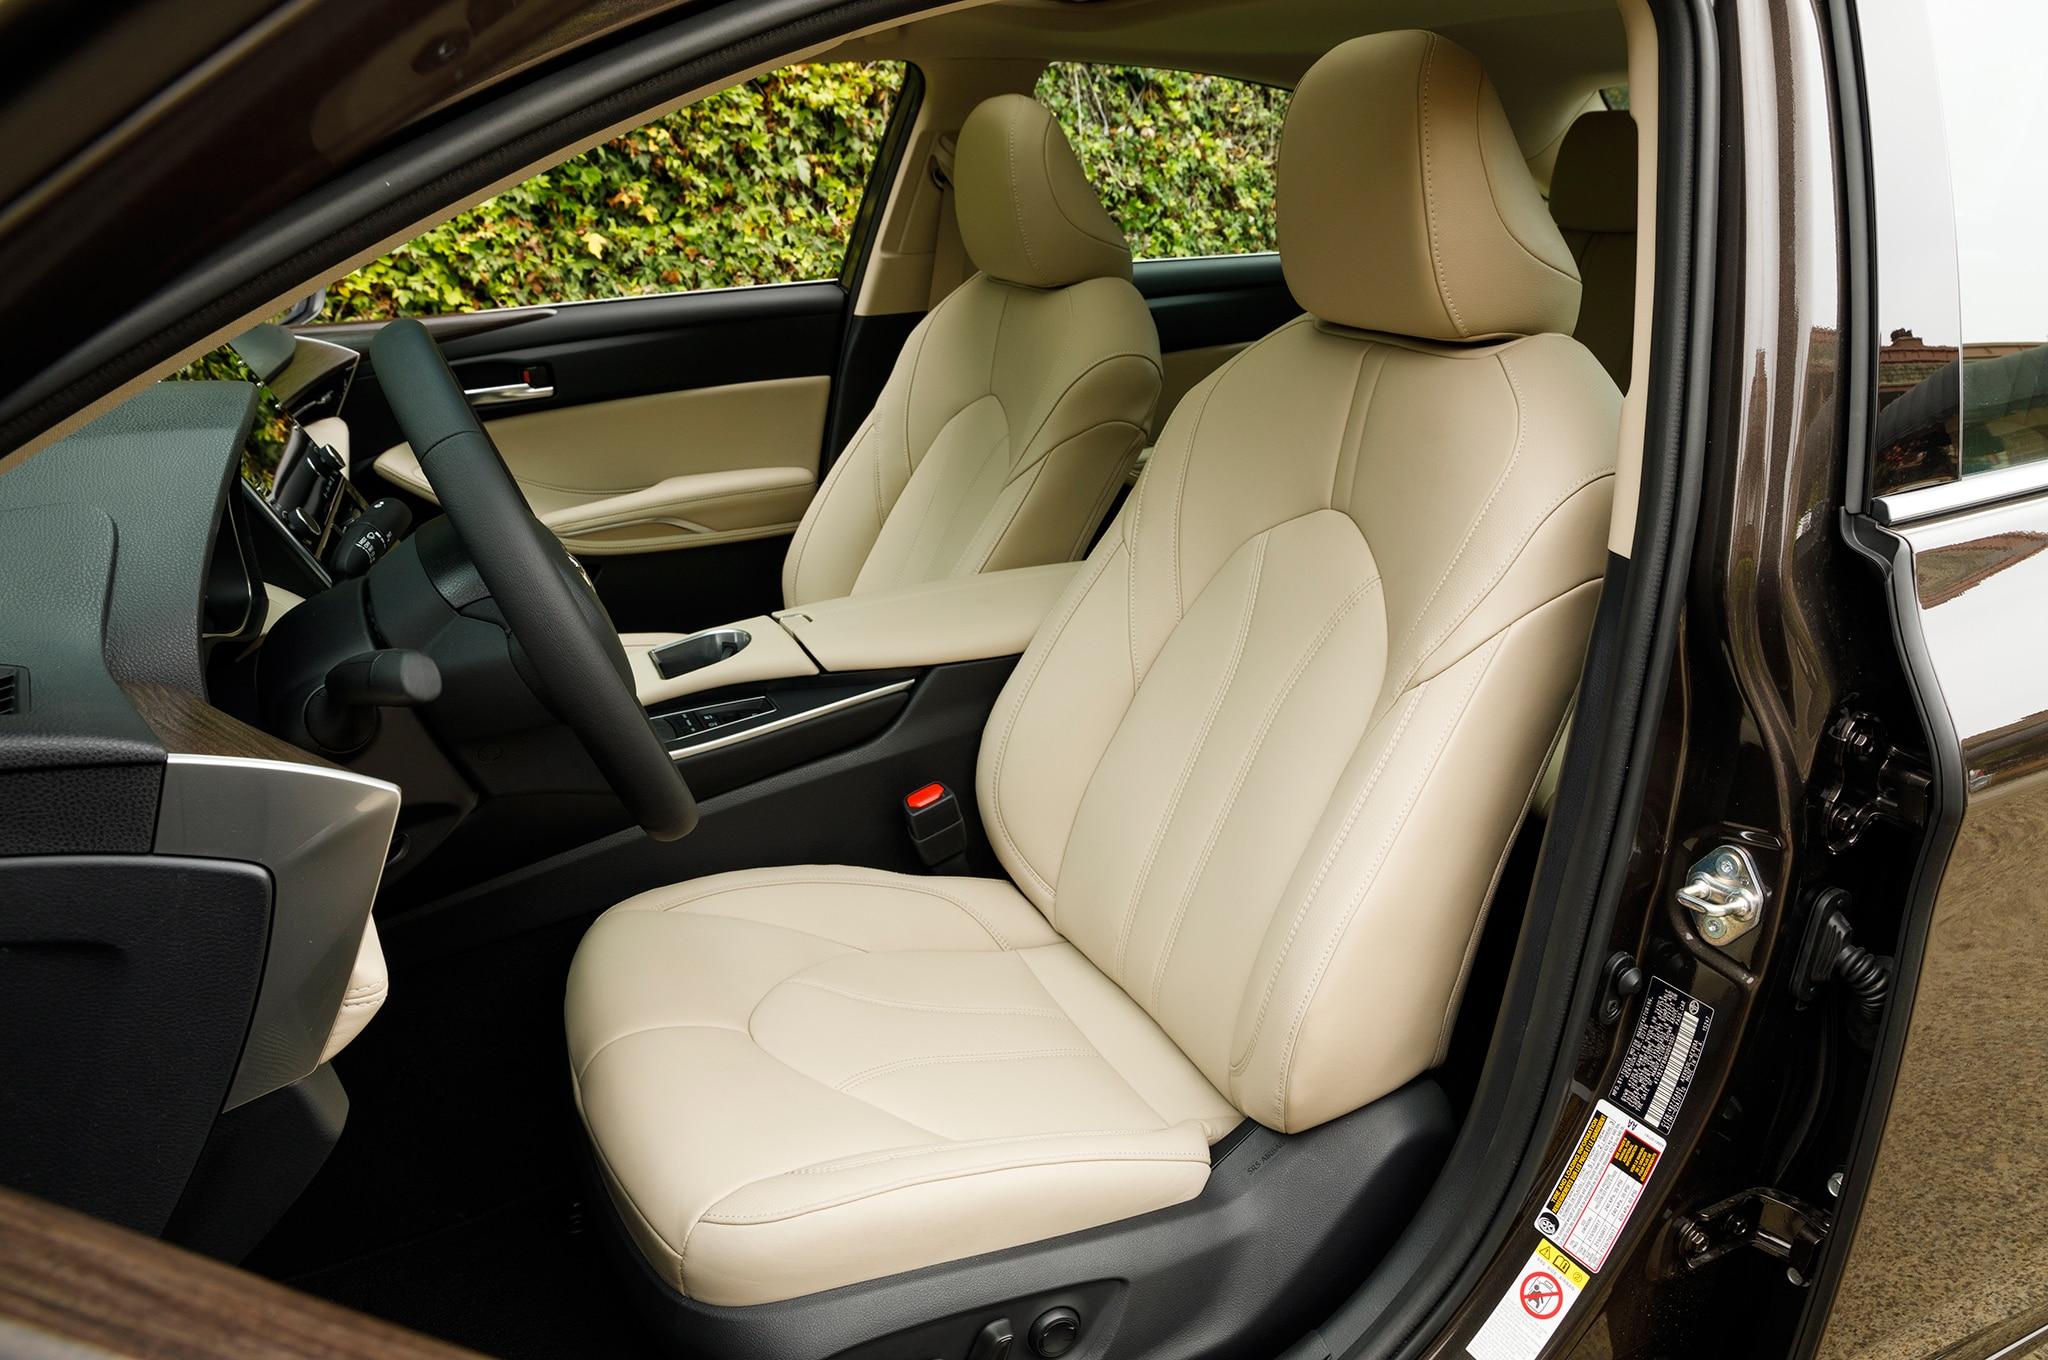 2019 Toyota Avalon Xle Hybrid Front Interior Seats 13 Abril 2018 Erika Pizano